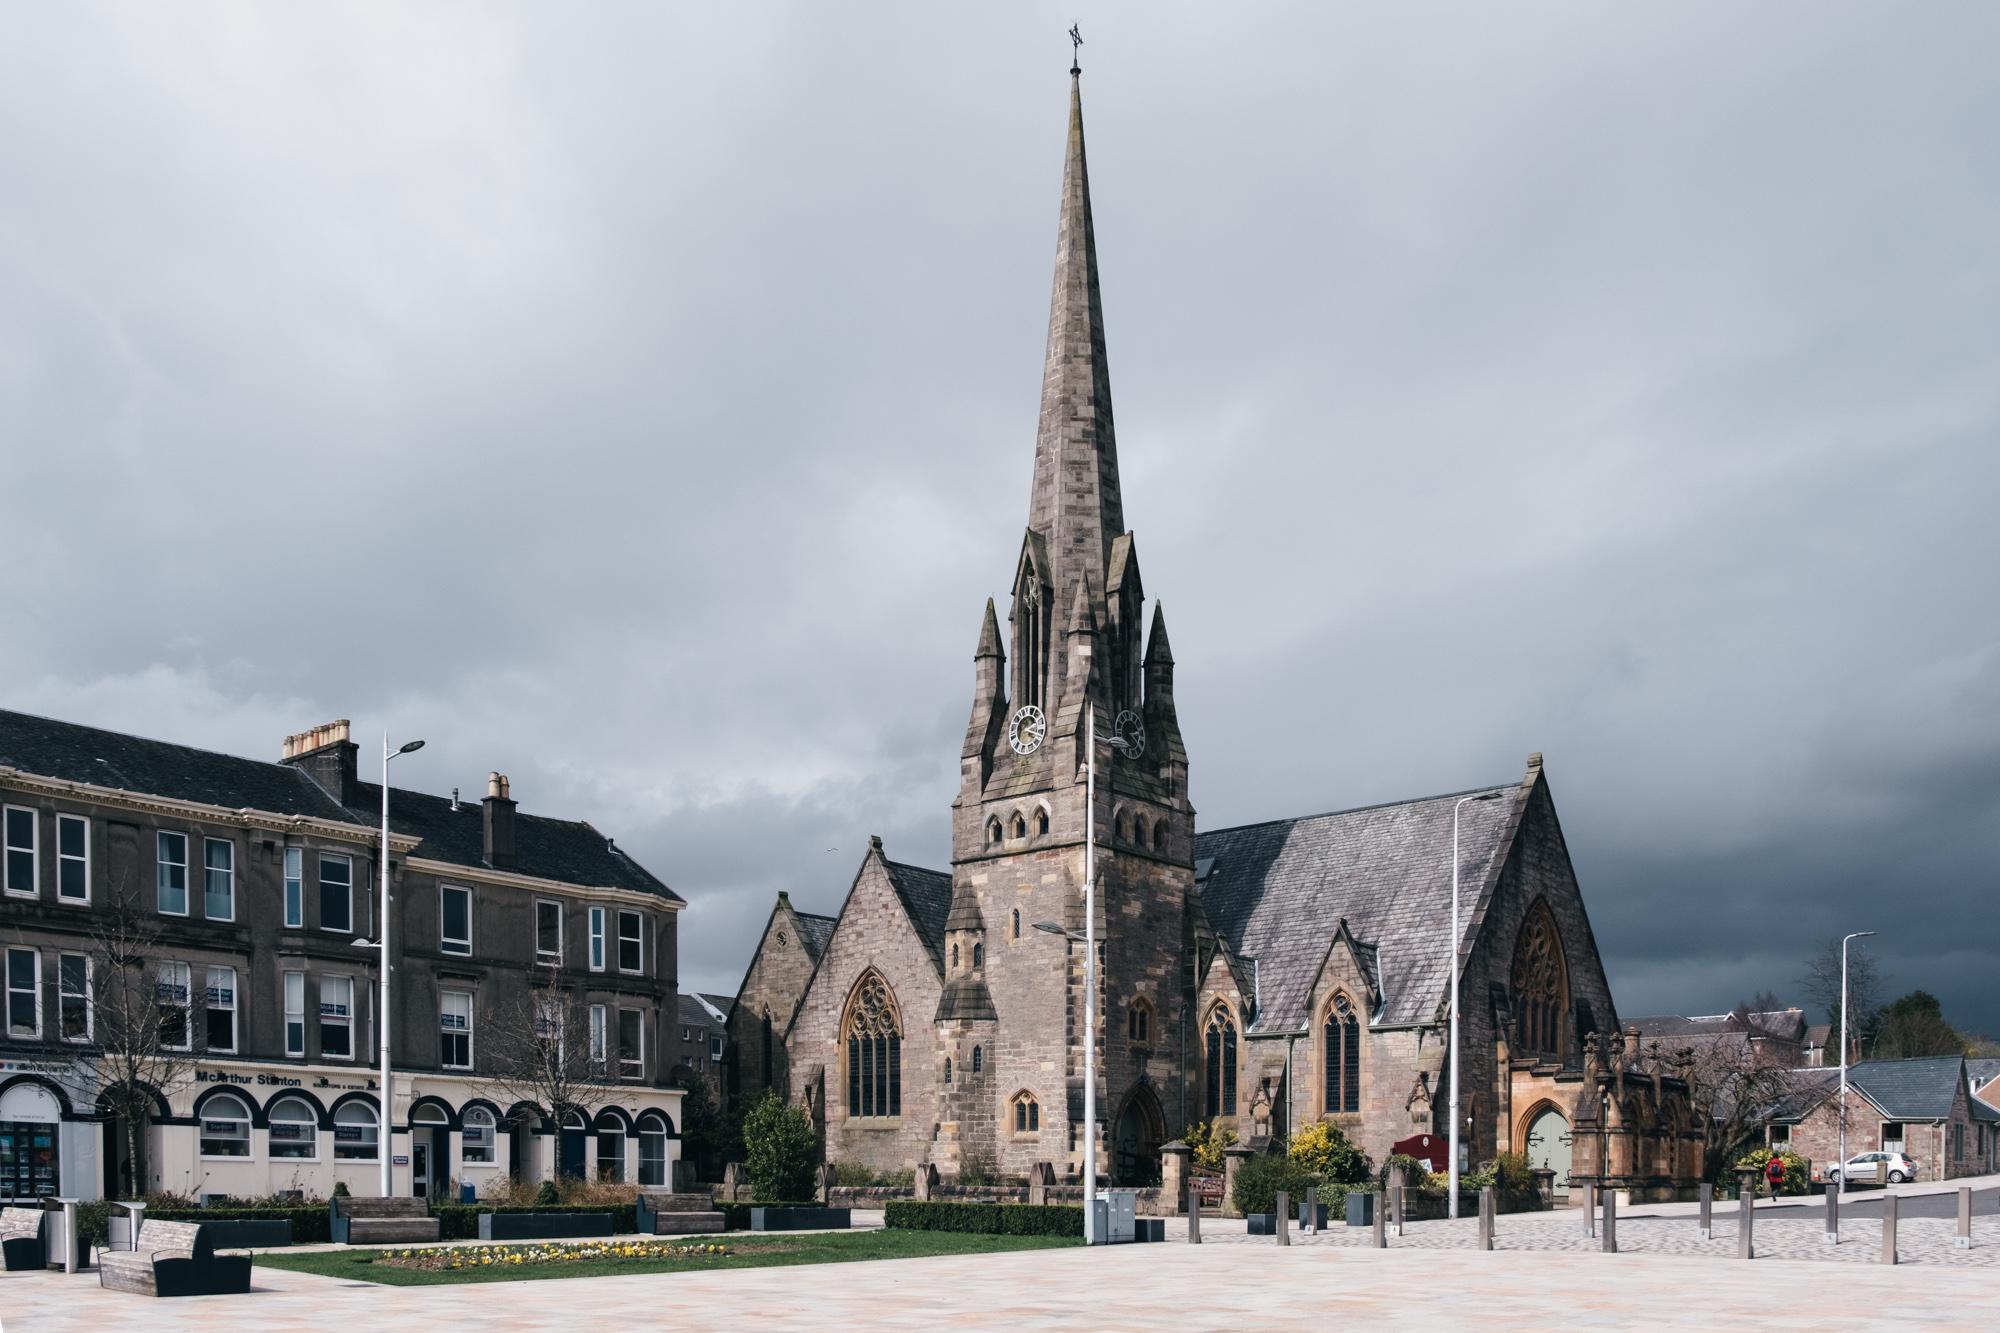 colquhoun-square-helensburgh-parish-church-scotland.jpg